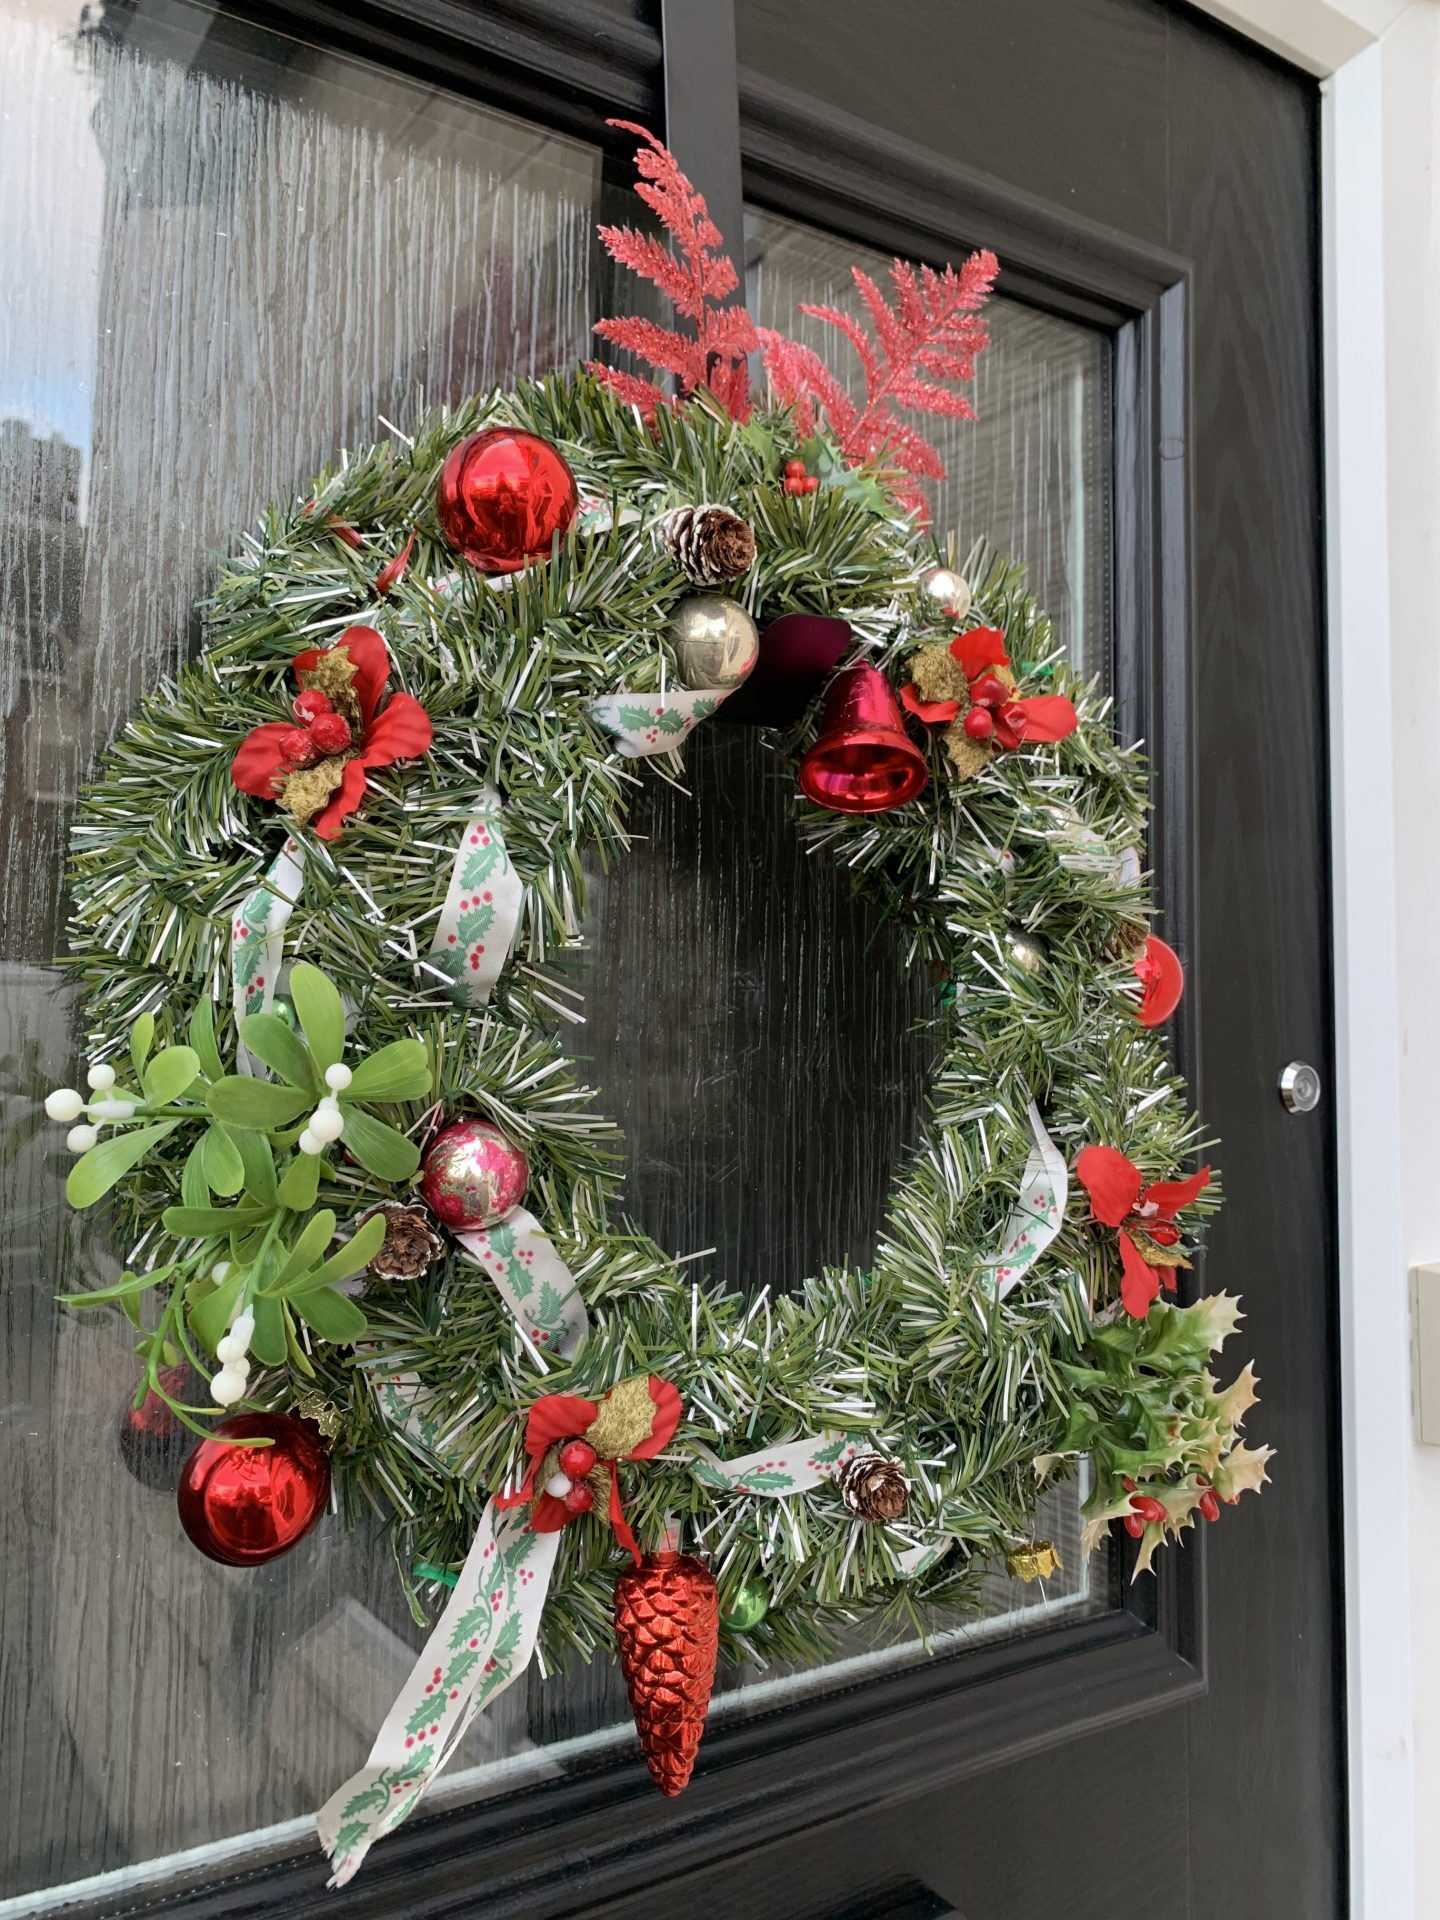 Our Vintage Christmas Decorations   wreath